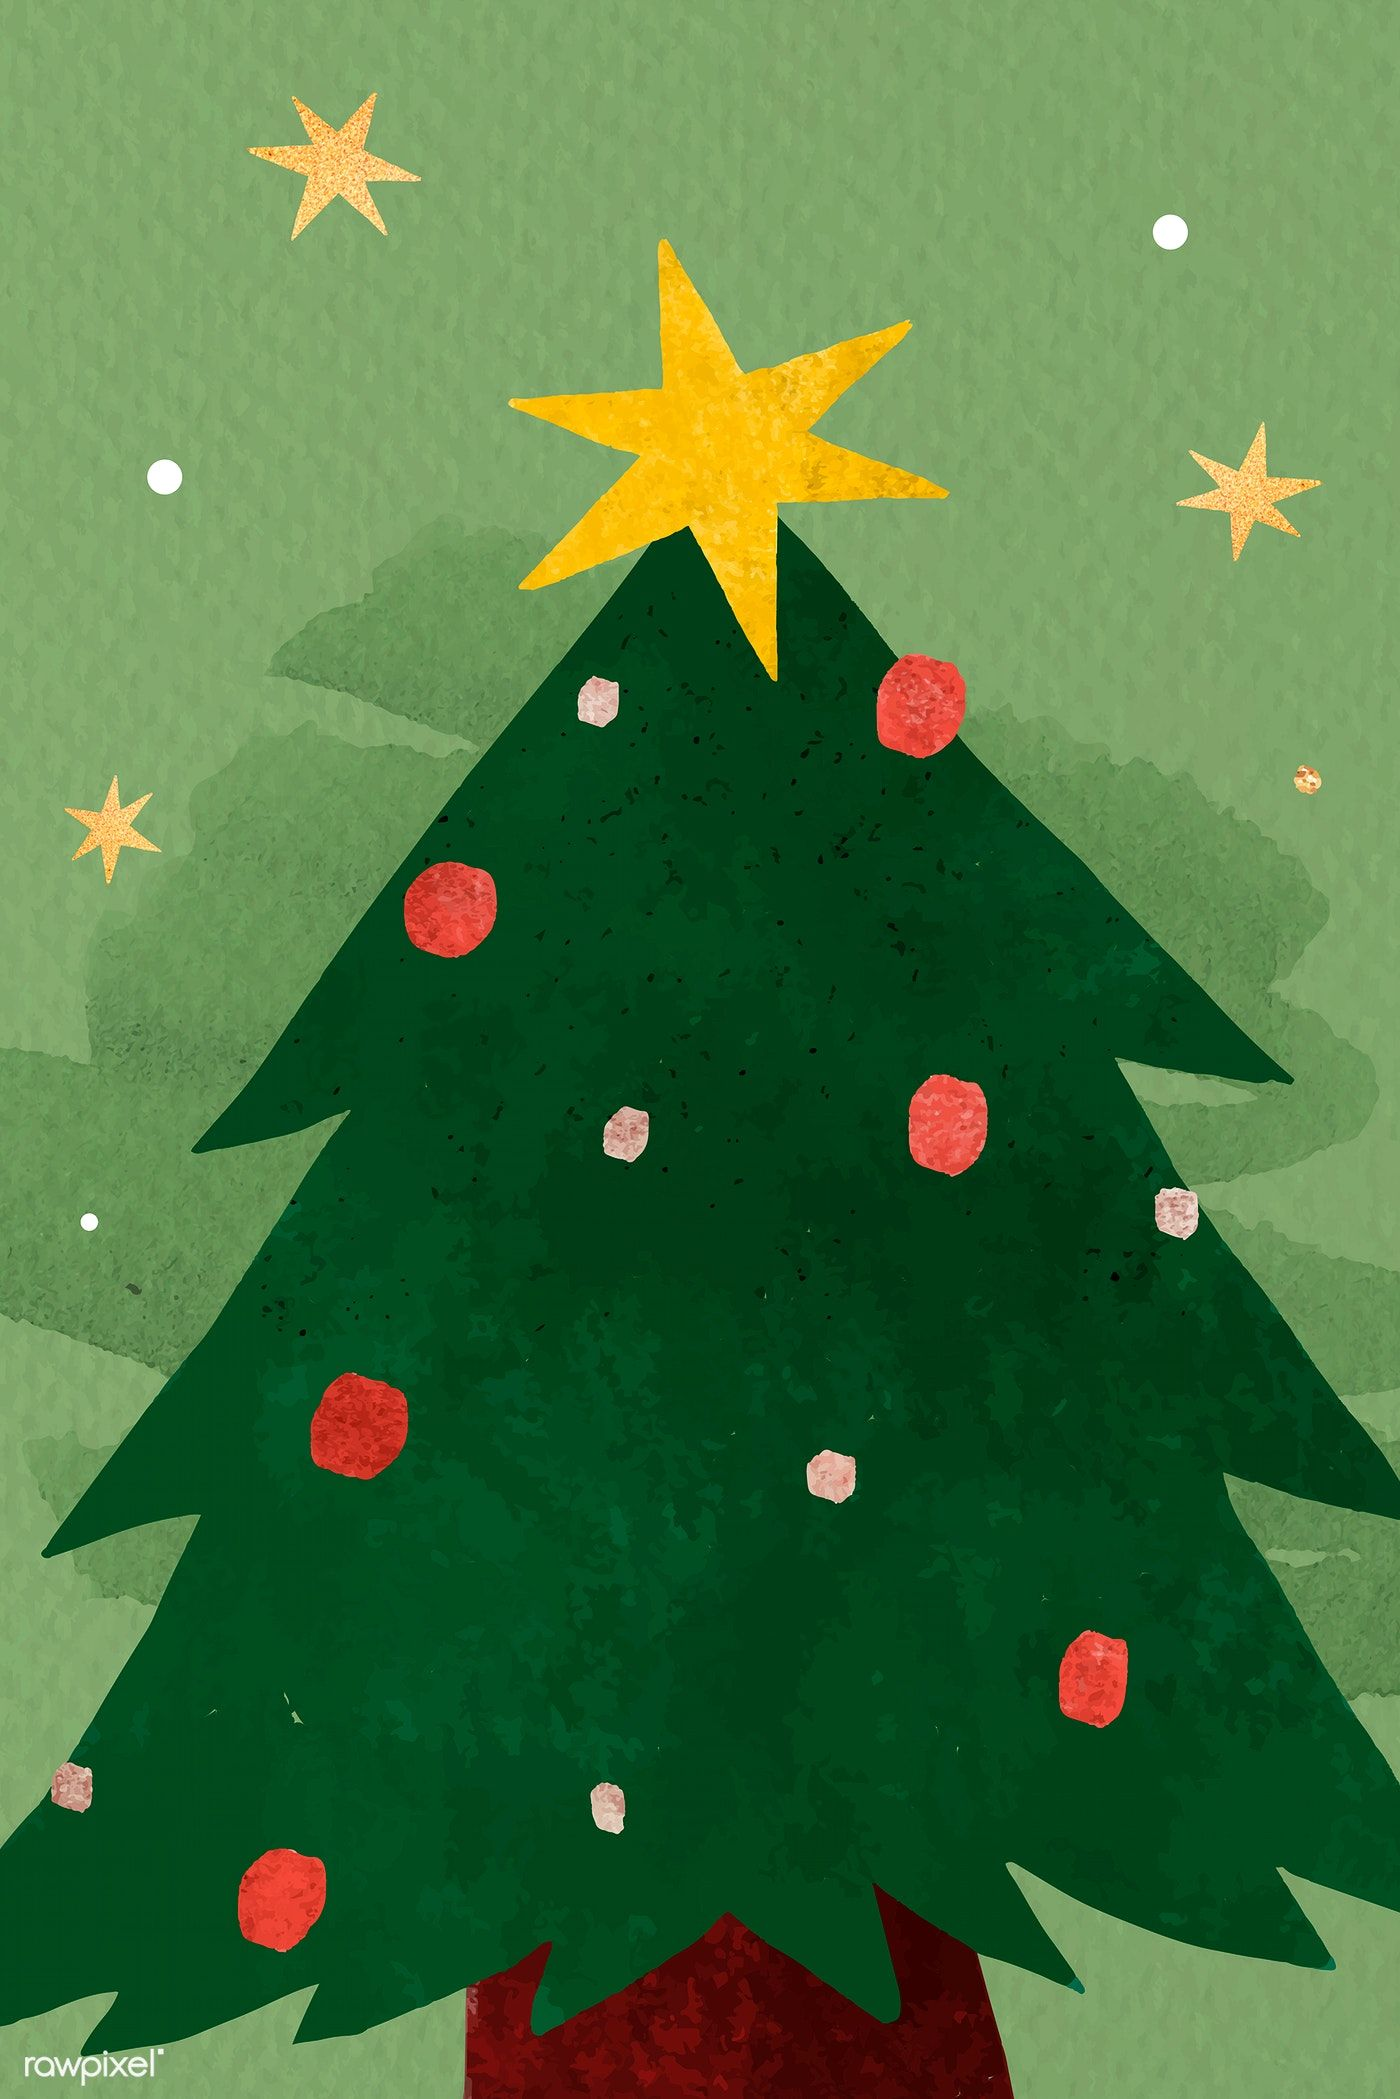 Download premium vector of Christmas tree doodle